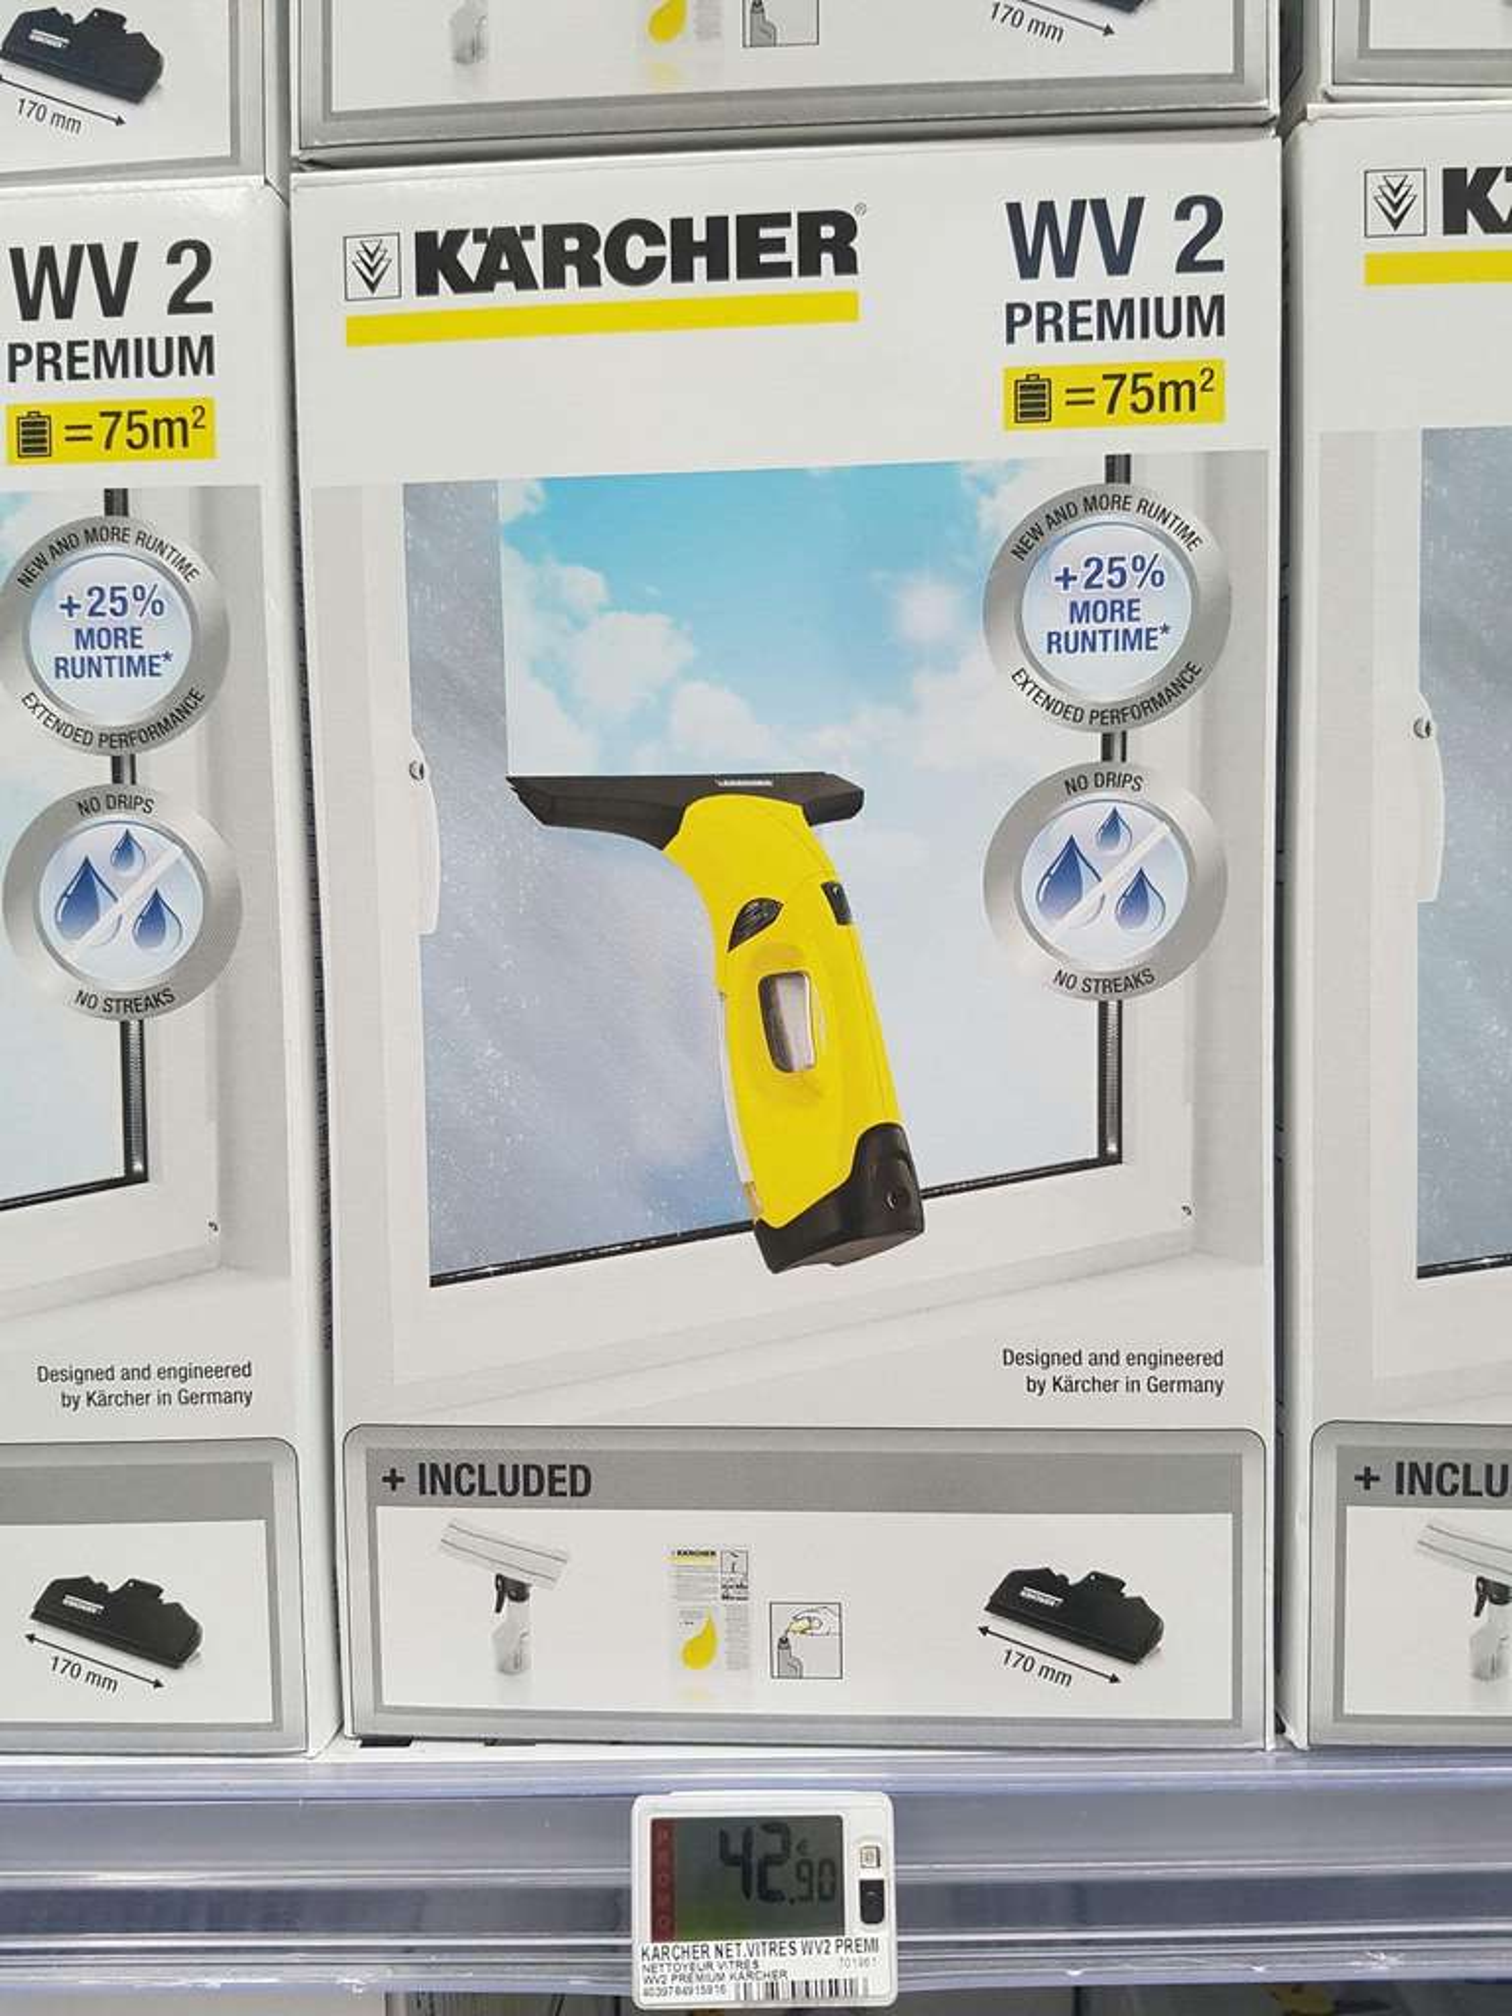 nettoyeur vitre karcher wv2 premium. Black Bedroom Furniture Sets. Home Design Ideas